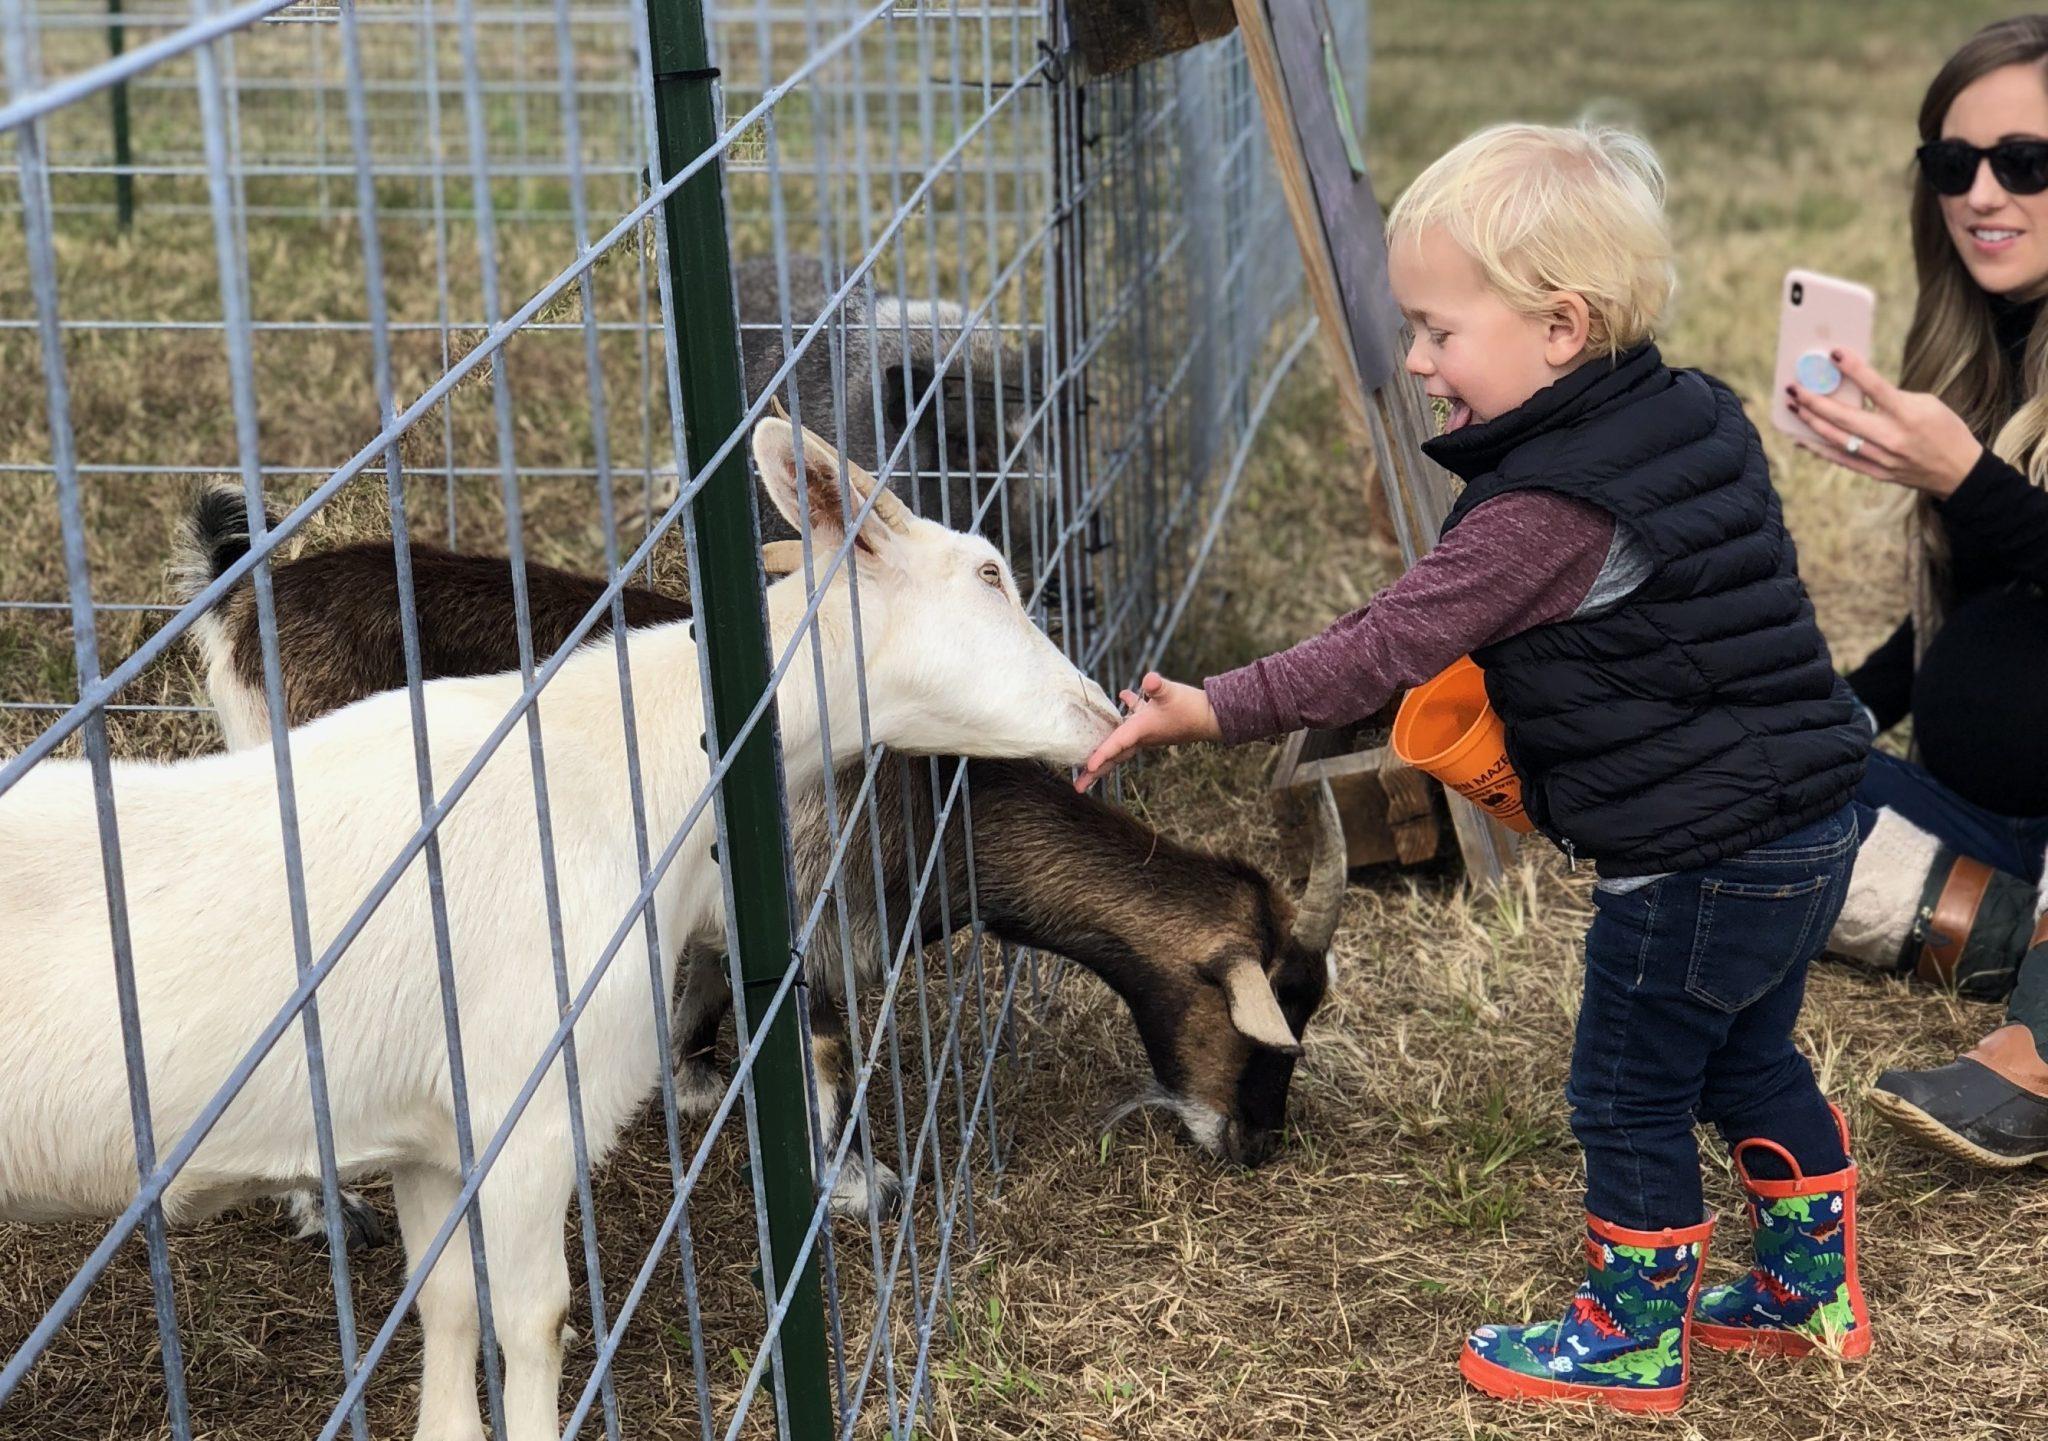 Fall Farm Tour goat and child mom photo